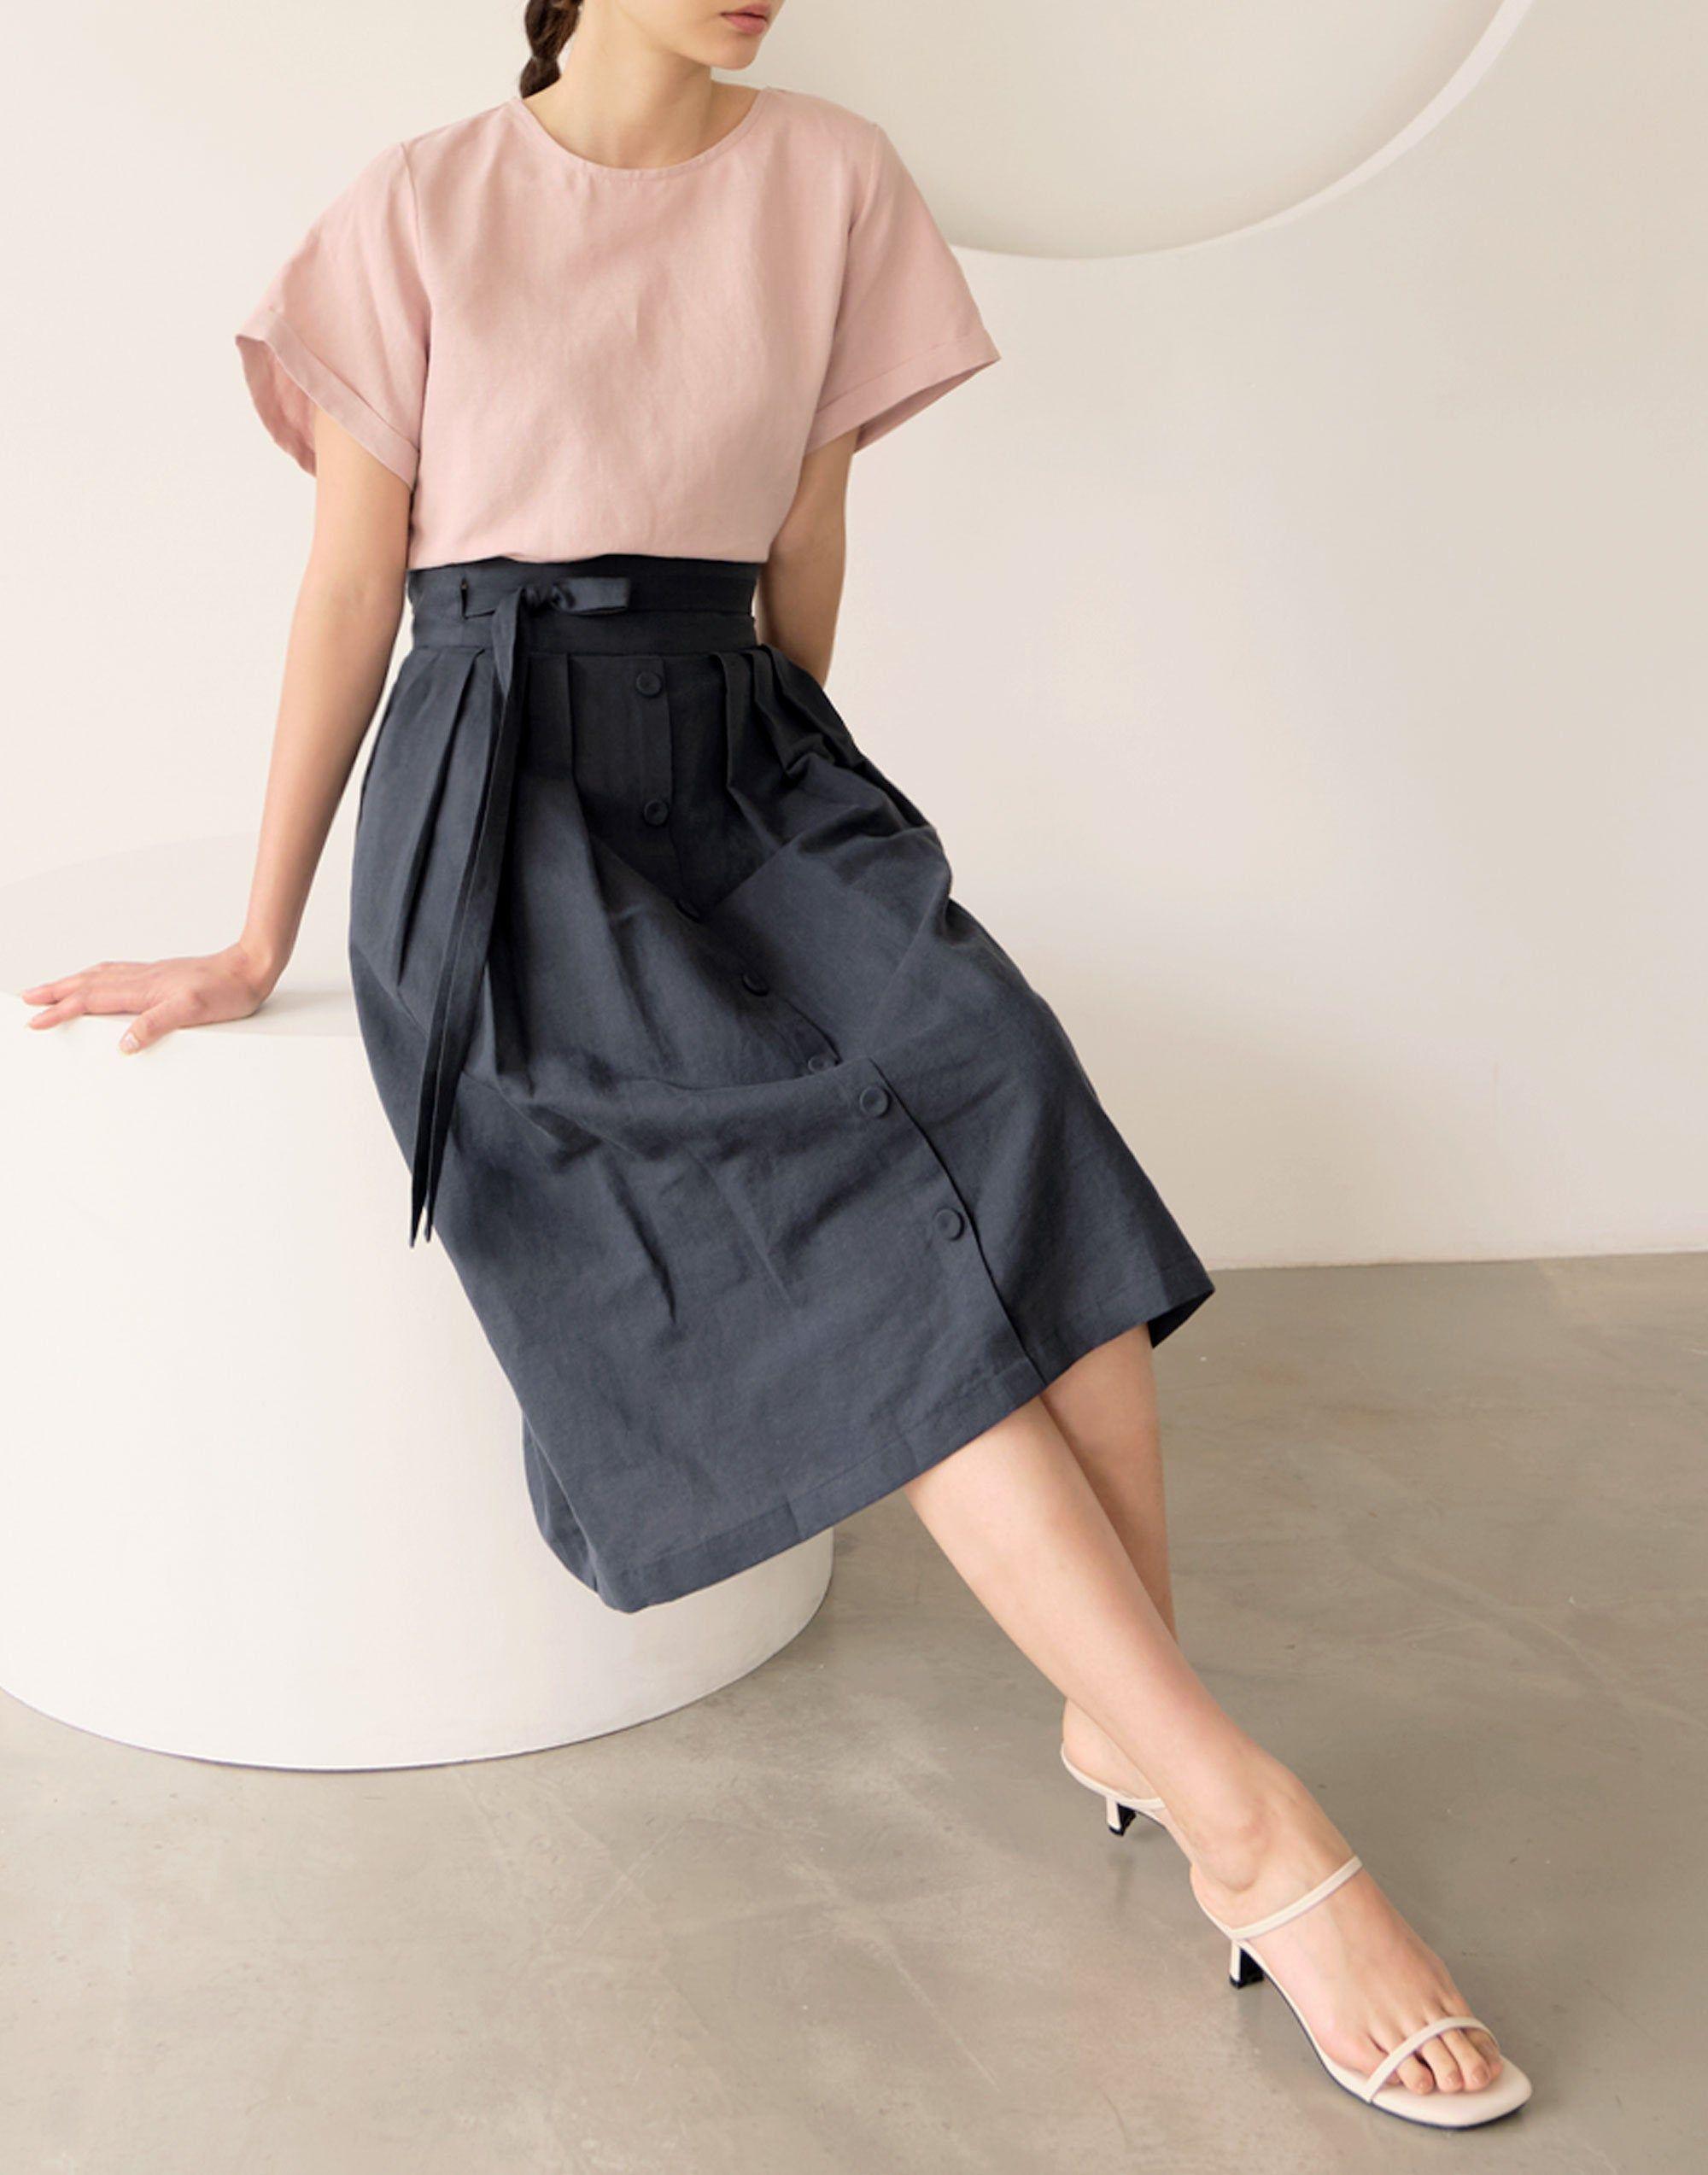 TETEROT SALON Women's Wrap Skirt Hanbok Korean Vintage Navyblue Party Long Skirt 도레미 네이비